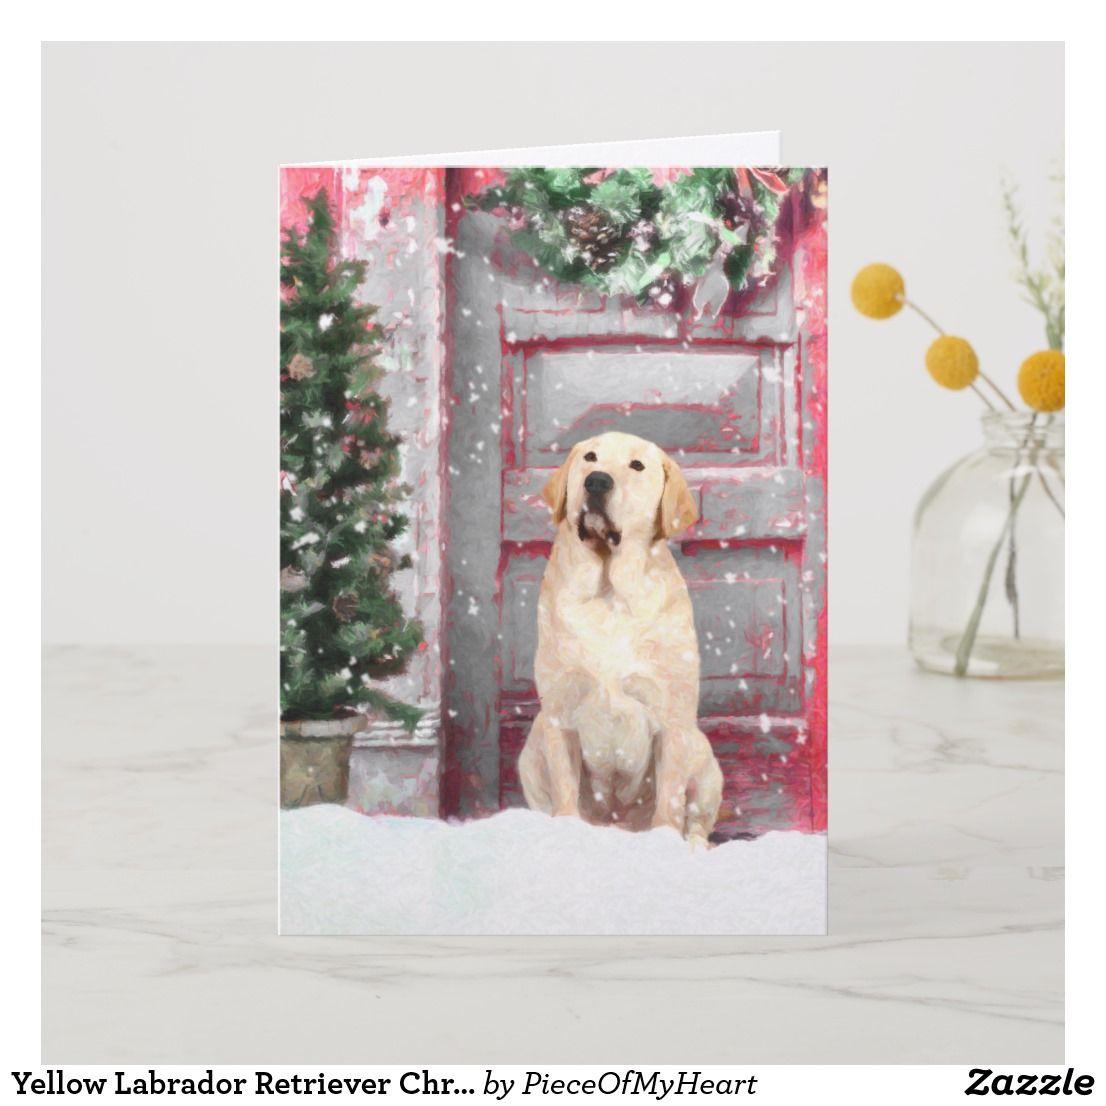 Yellow Labrador Retriever Christmas Greeting Cards in 2018 ...